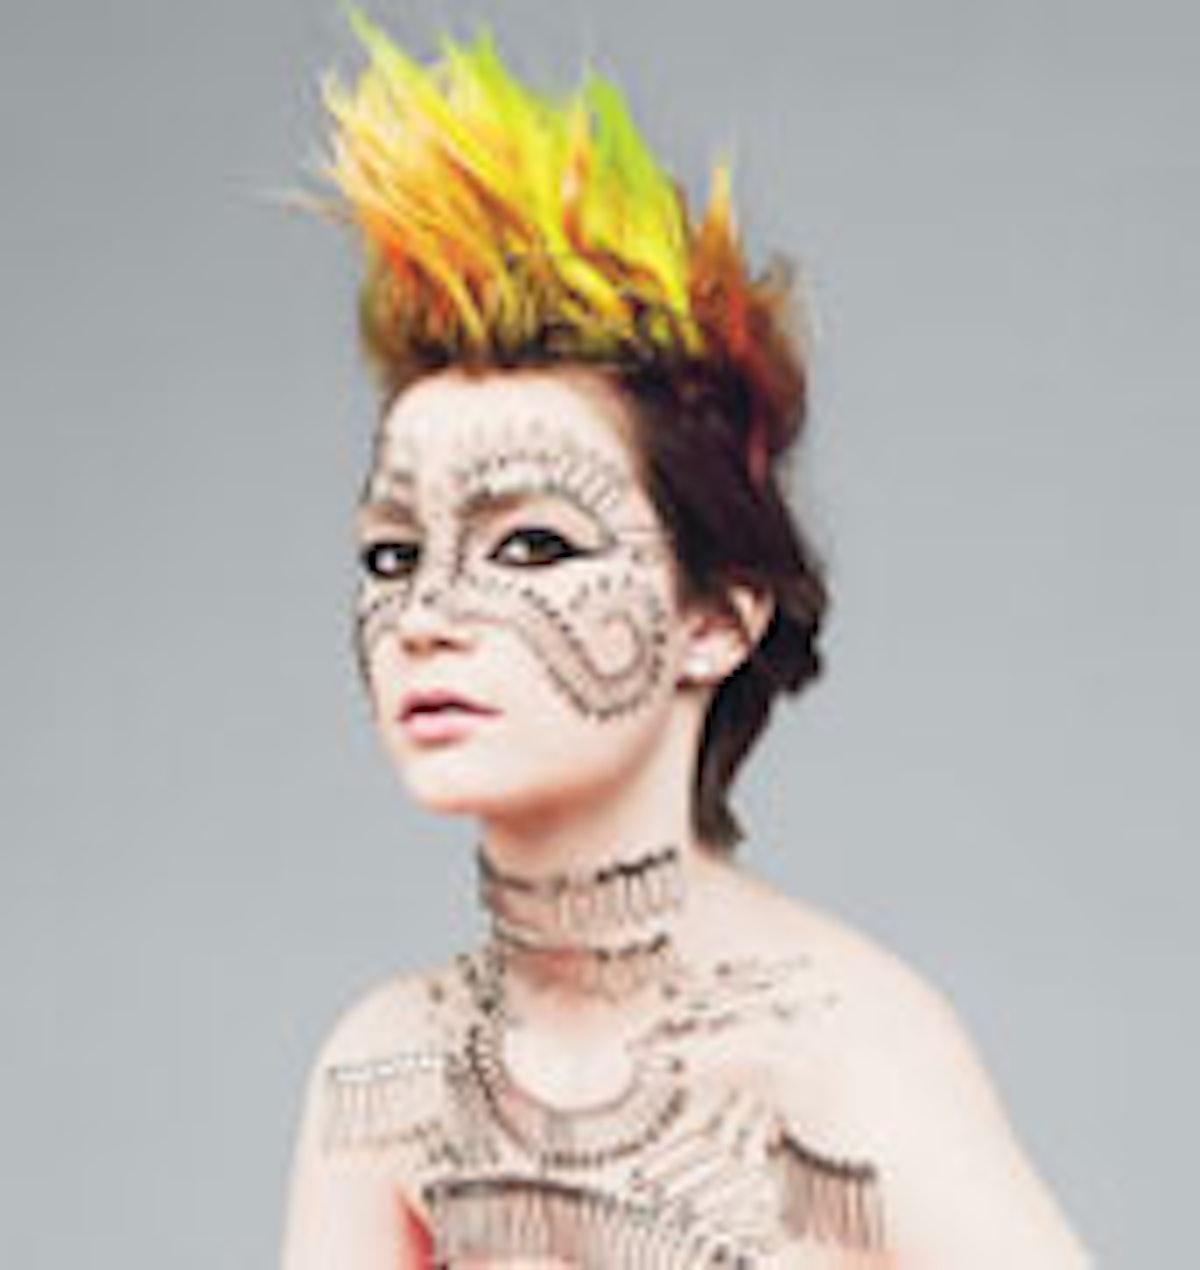 fass-mia-wasikowska-punk-search.jpg